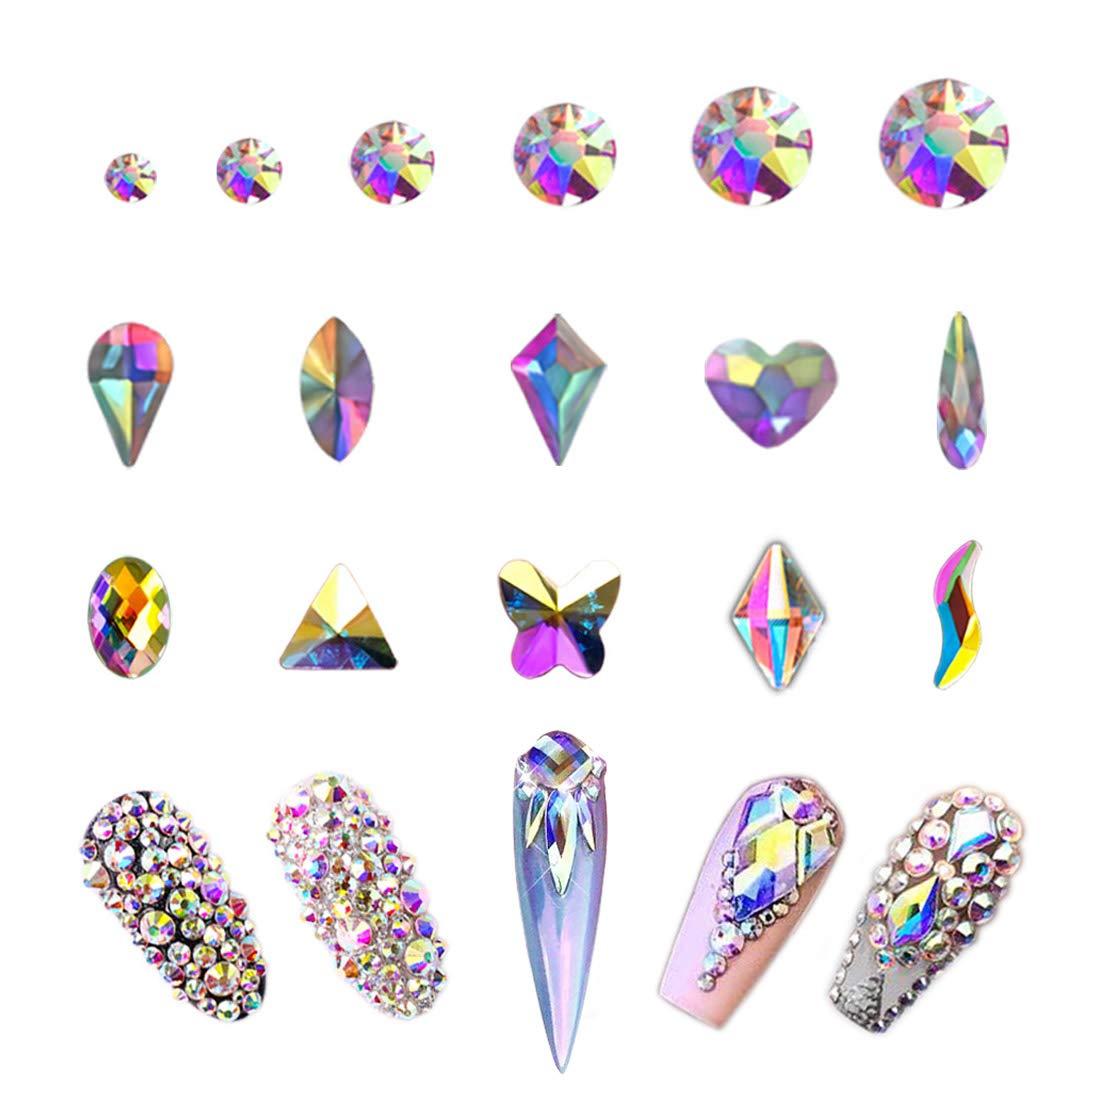 Denver Mall AB Crystal Rhinestones Set Max 51% OFF 100+1728 Multishape Pcs Round and